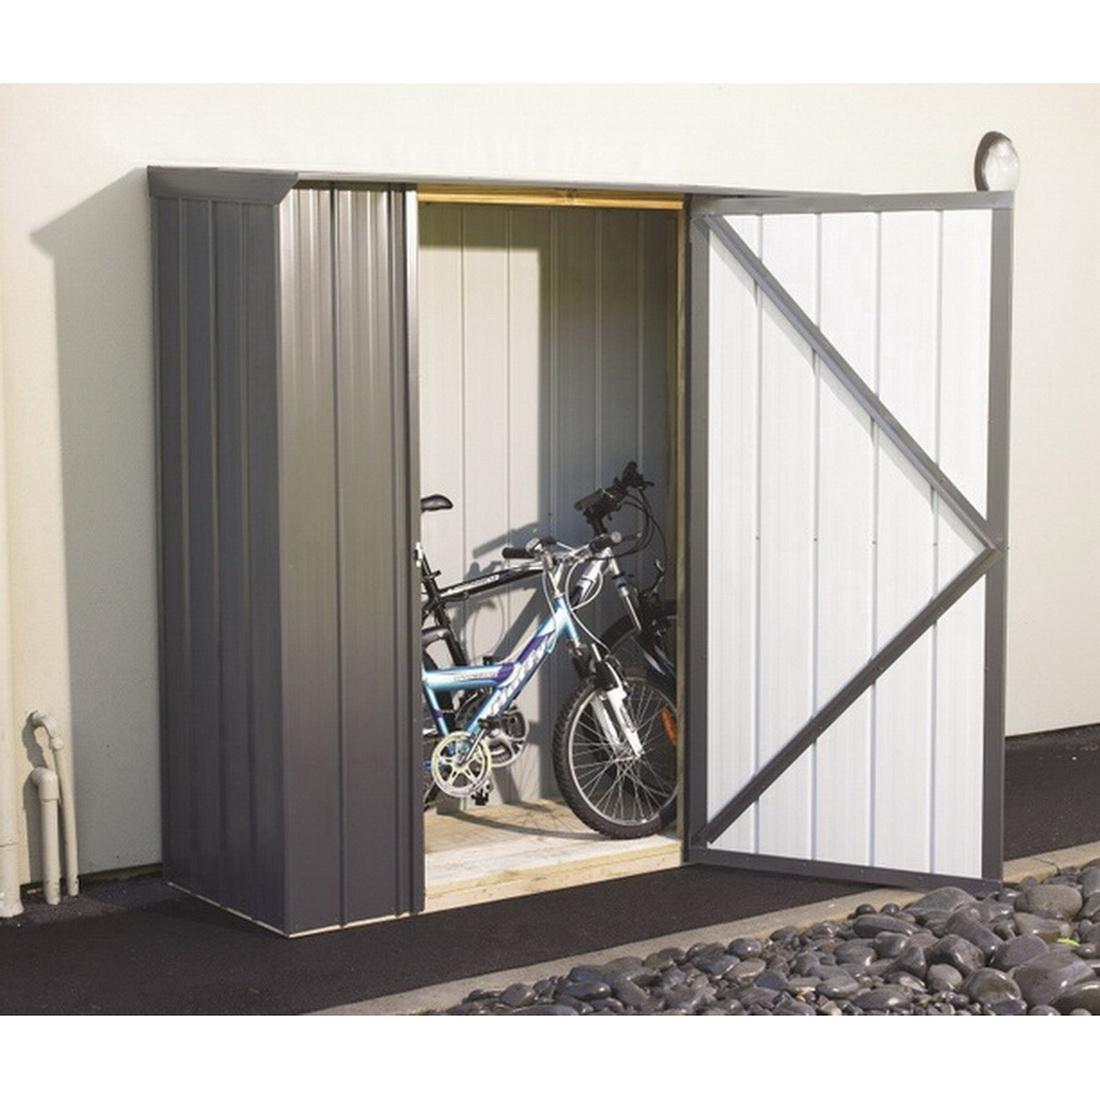 Fortress Colour Kitset Garden Shed Locker 1.81 x 0.685 x 1.975m